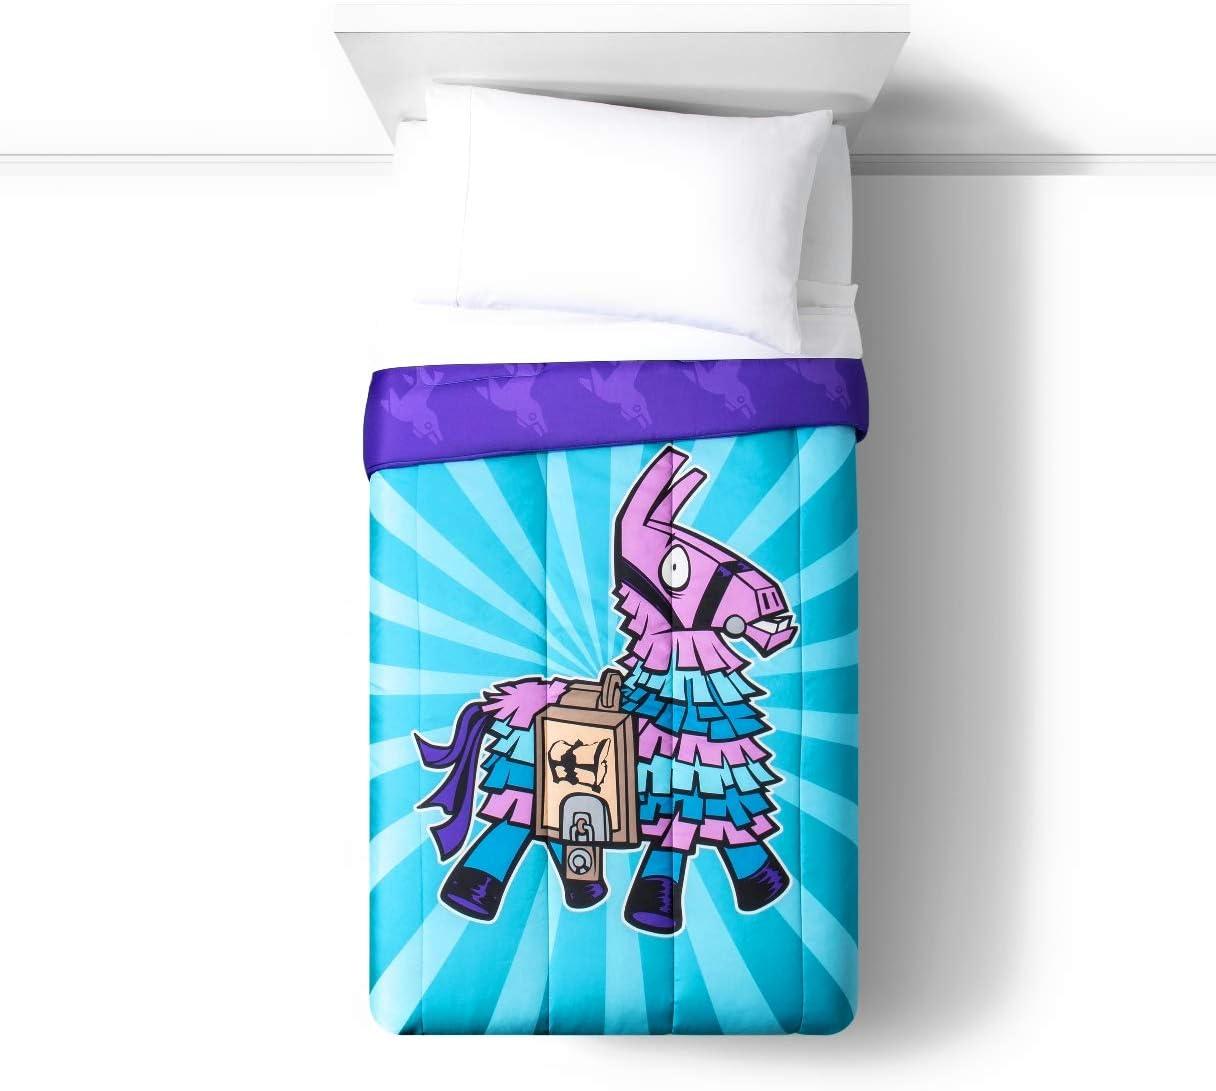 Fortnite Bedding Twin Sheet Set and Microfiber Comforter - Llama Design